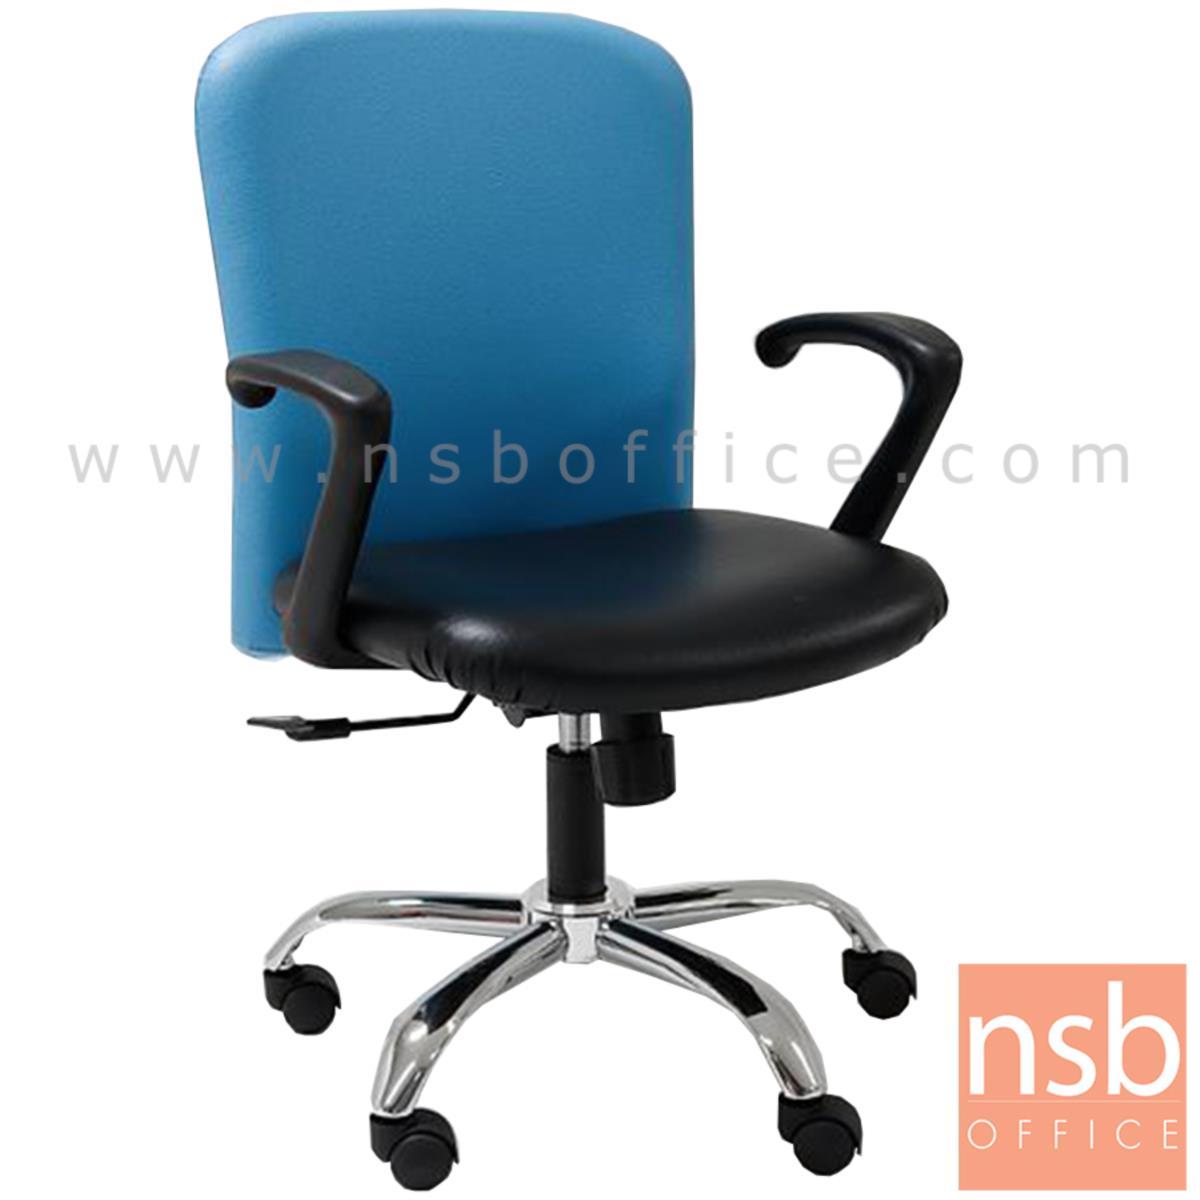 B03A384:เก้าอี้สำนักงาน รุ่น Stiller (สติลเลอร์)  โช๊คแก๊ส มีก้อนโยก ขาเหล็กชุบโครเมี่ยม